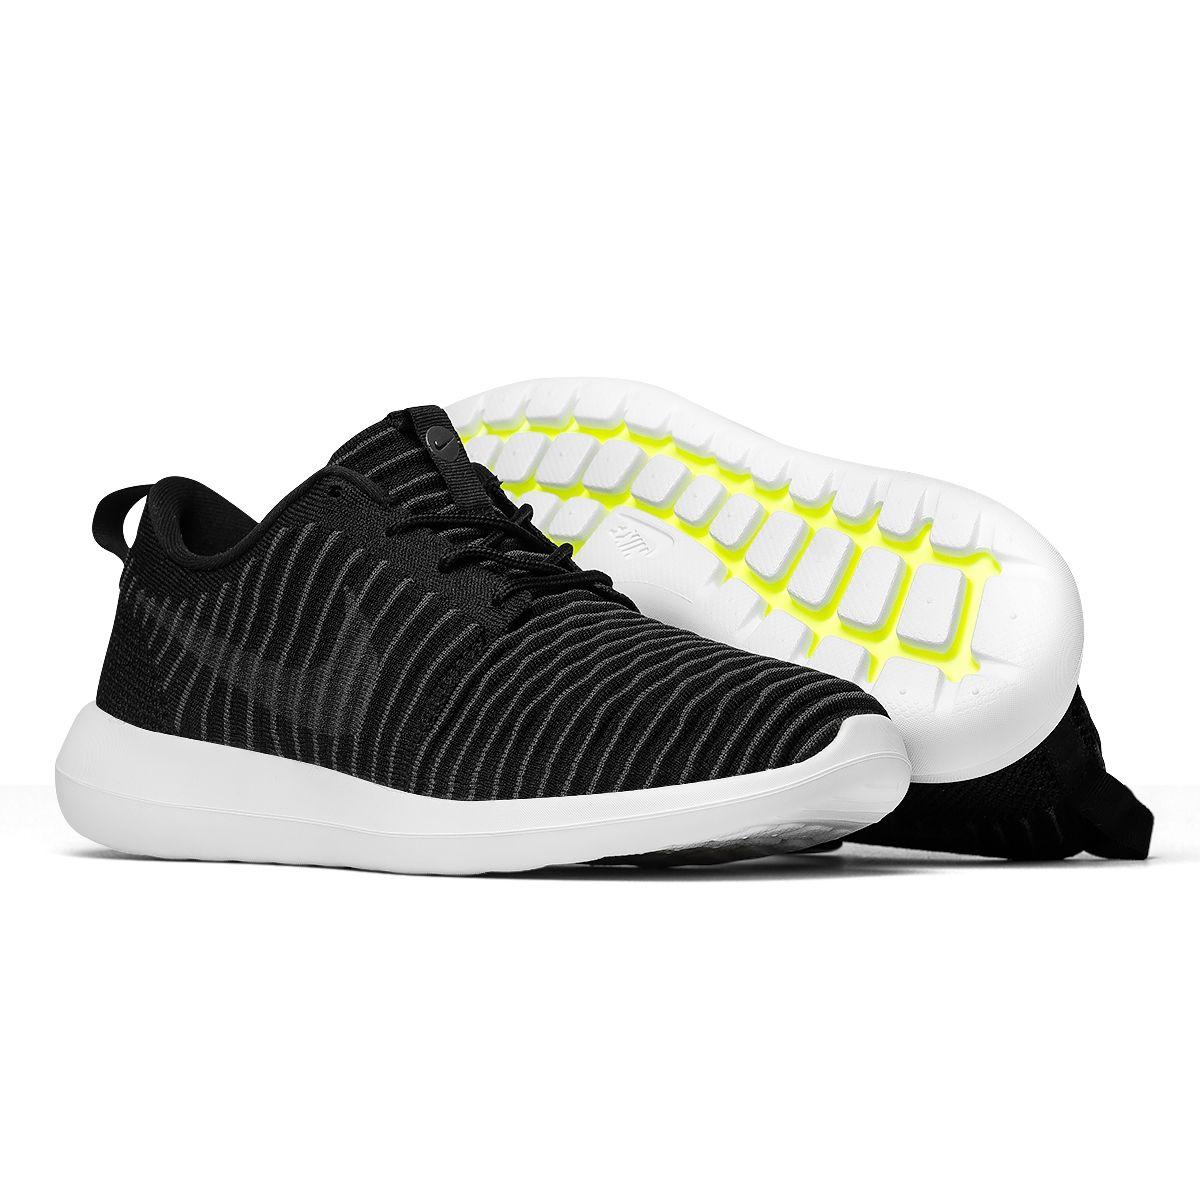 4bf8d277050 Tênis Nike Roshe Two Flyknit Preto - Maze